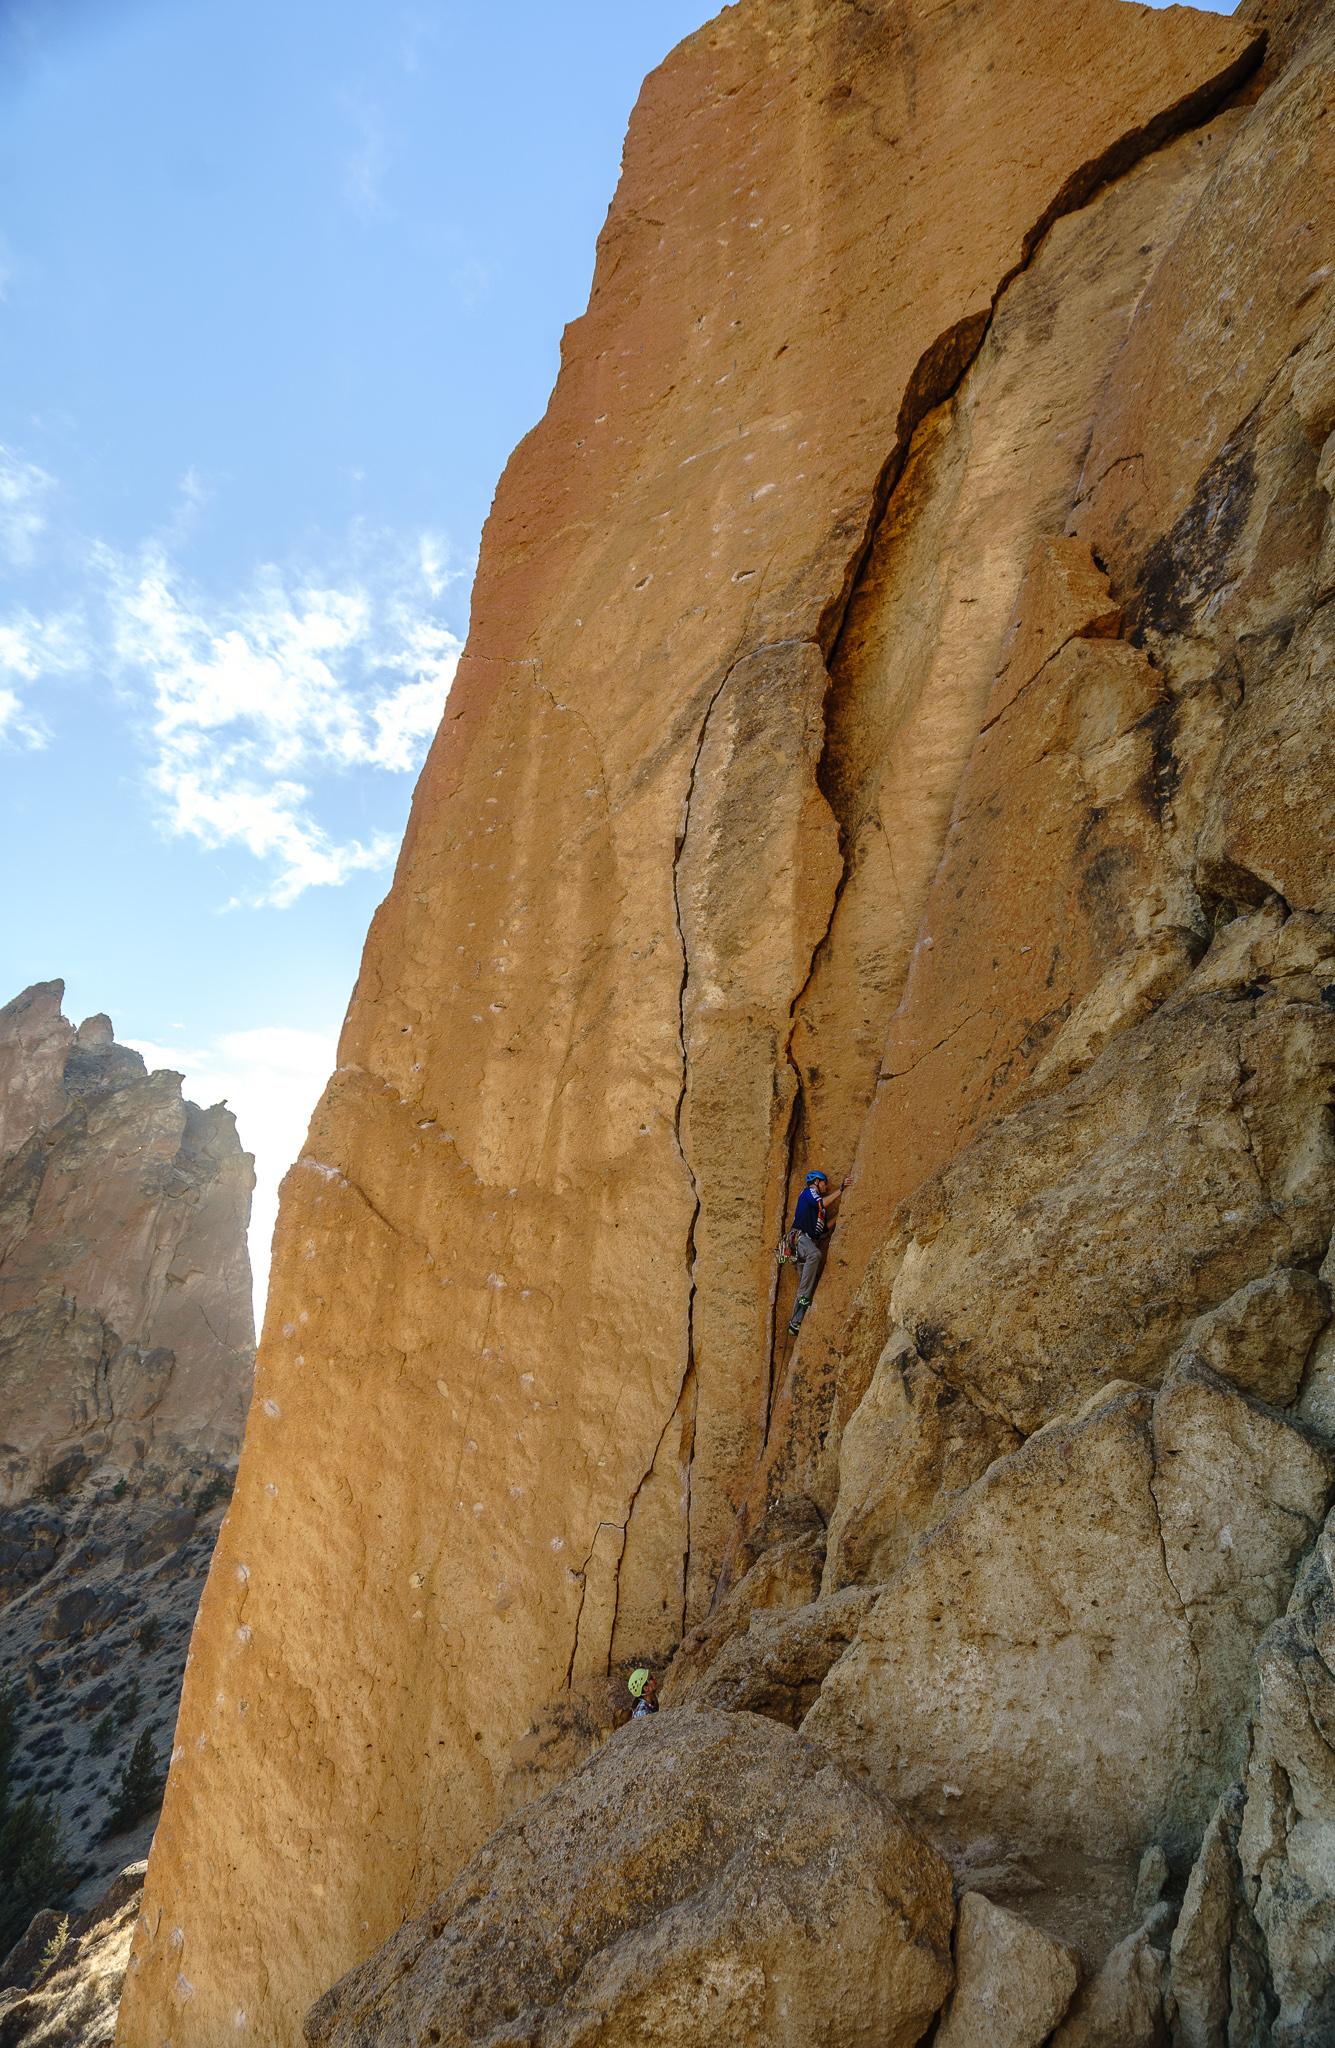 Climber's trad climbing (placing their own gear)